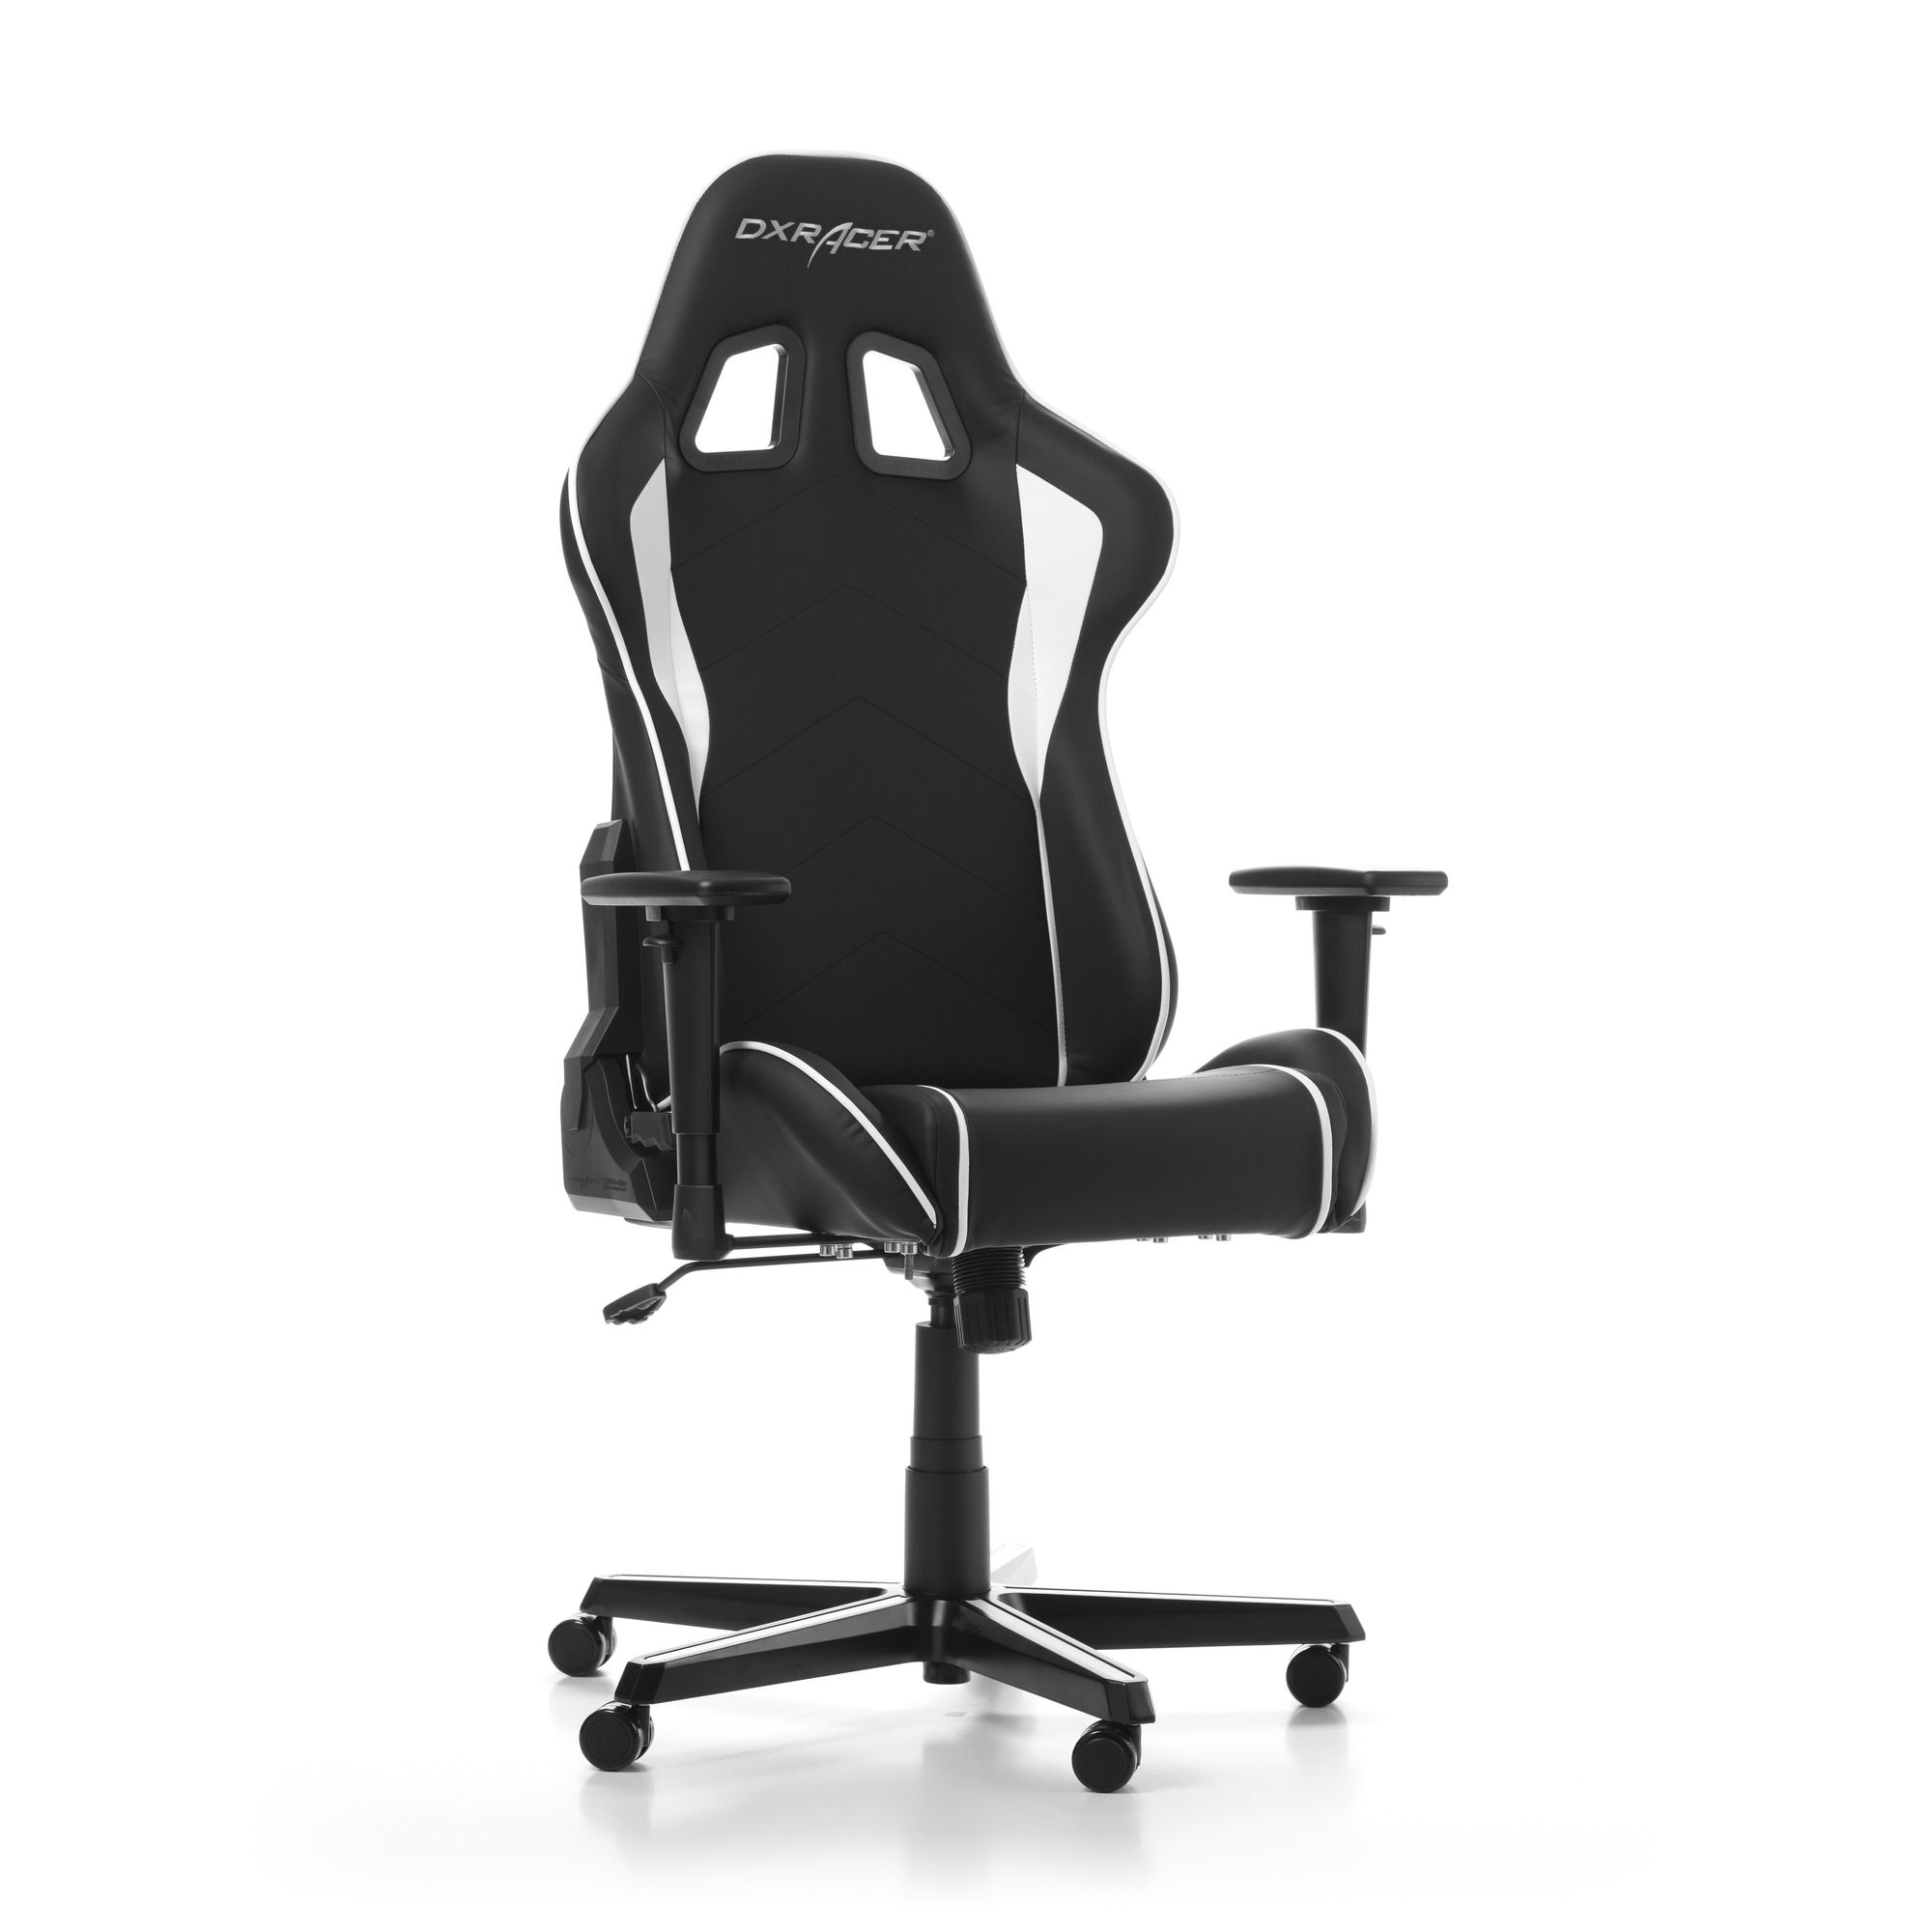 Гейминг стол DXRacer OH/FH08/NW - серия FORMULA, черен/бял - 8